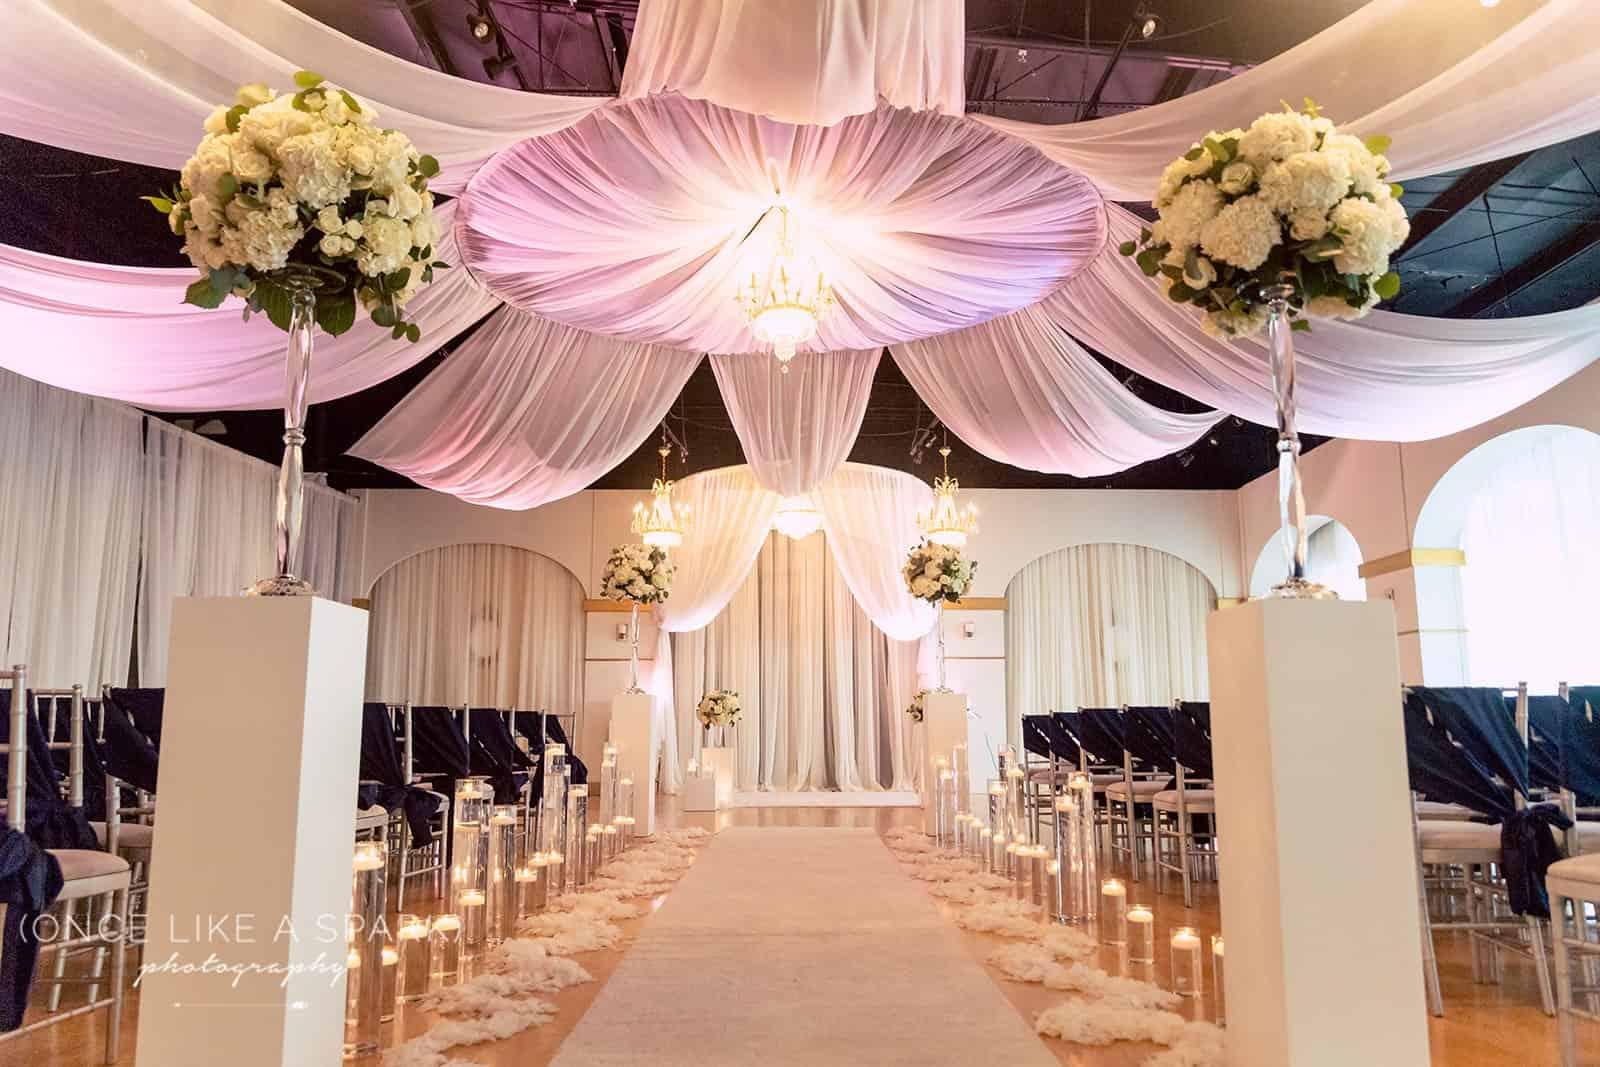 Book The Most Beautiful Atlanta Wedding Venue Today!